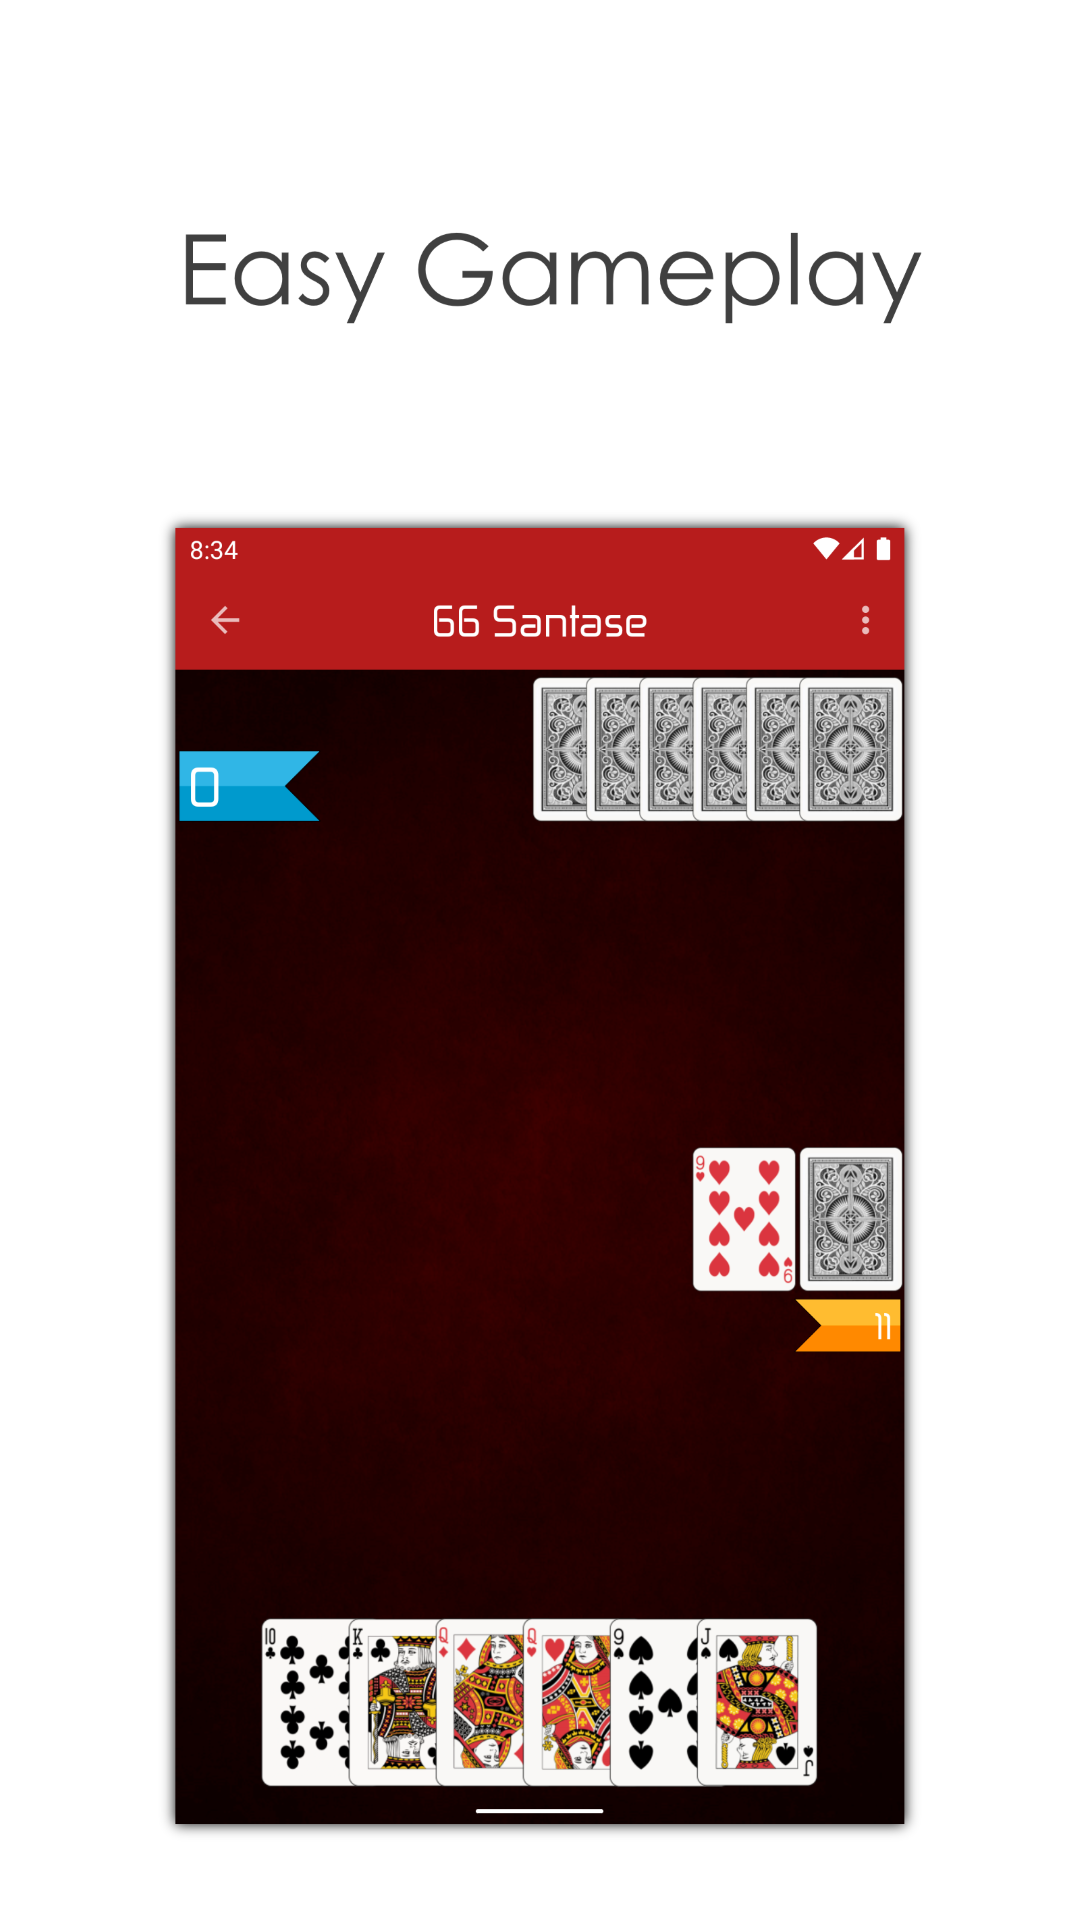 66 Santase - The Classic Card Game